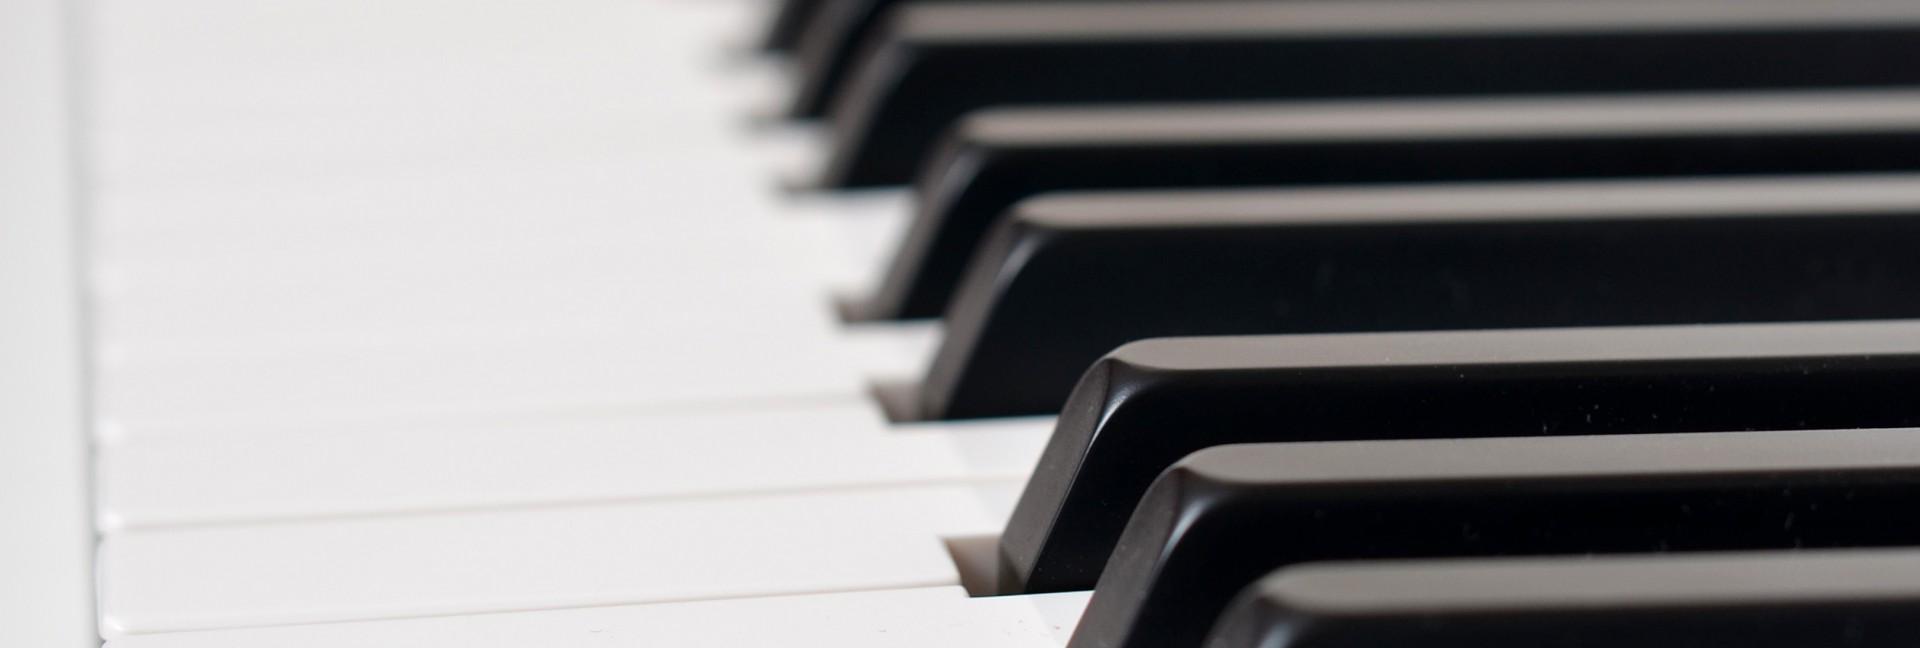 Klavier Slider.jpg